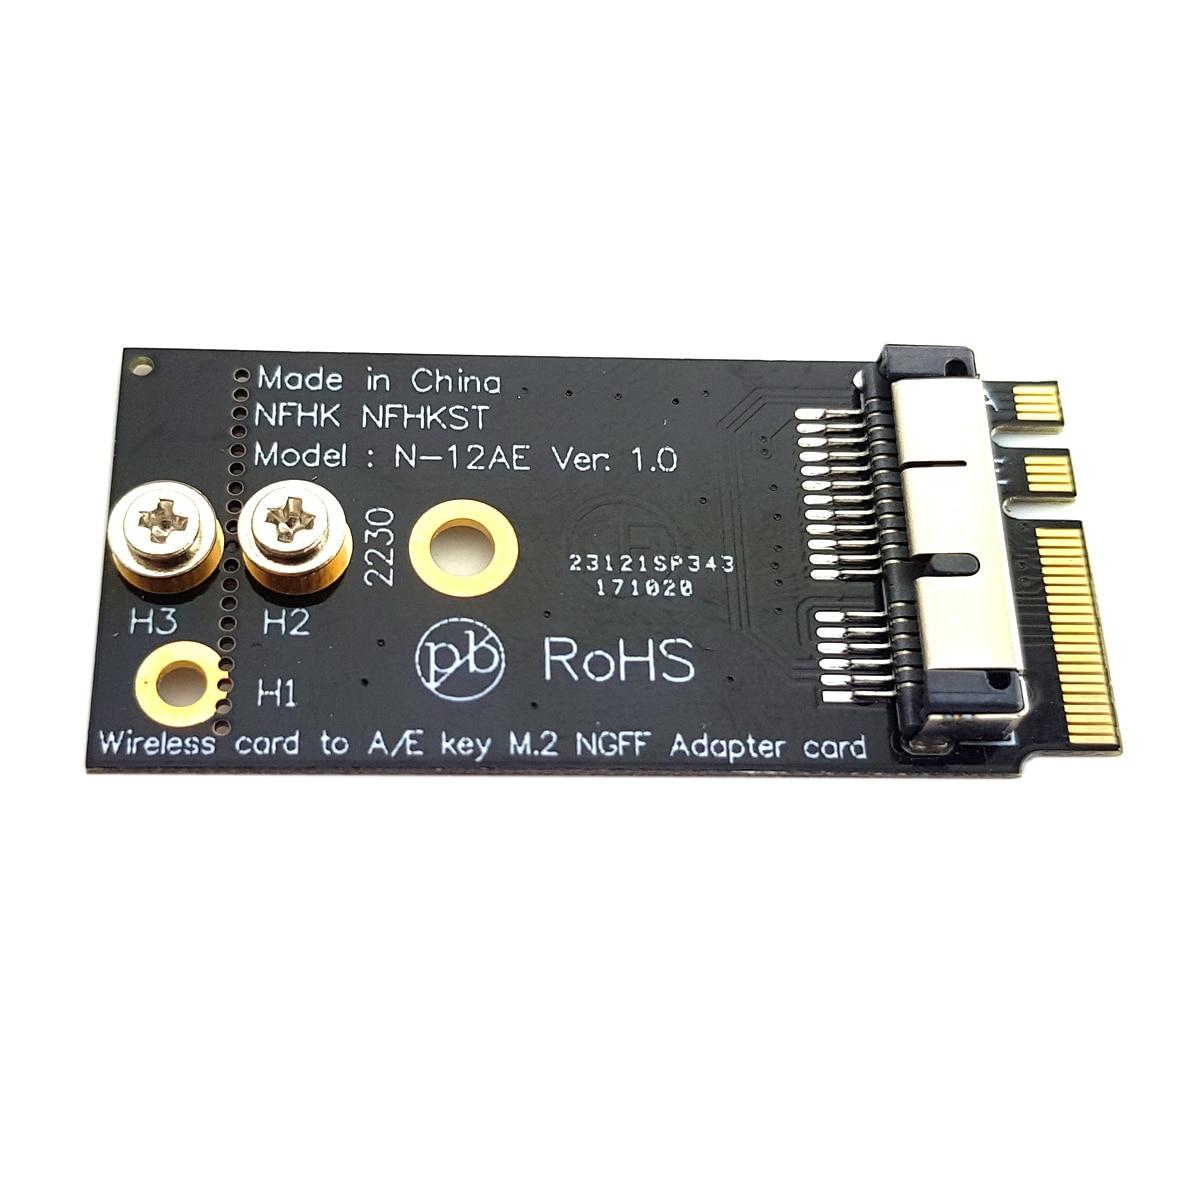 JSER BCM94360CS2 BCM943224PCIEBT2 Wireless Card to NGFF M.2 Key A//E Adapter for Macbook OS